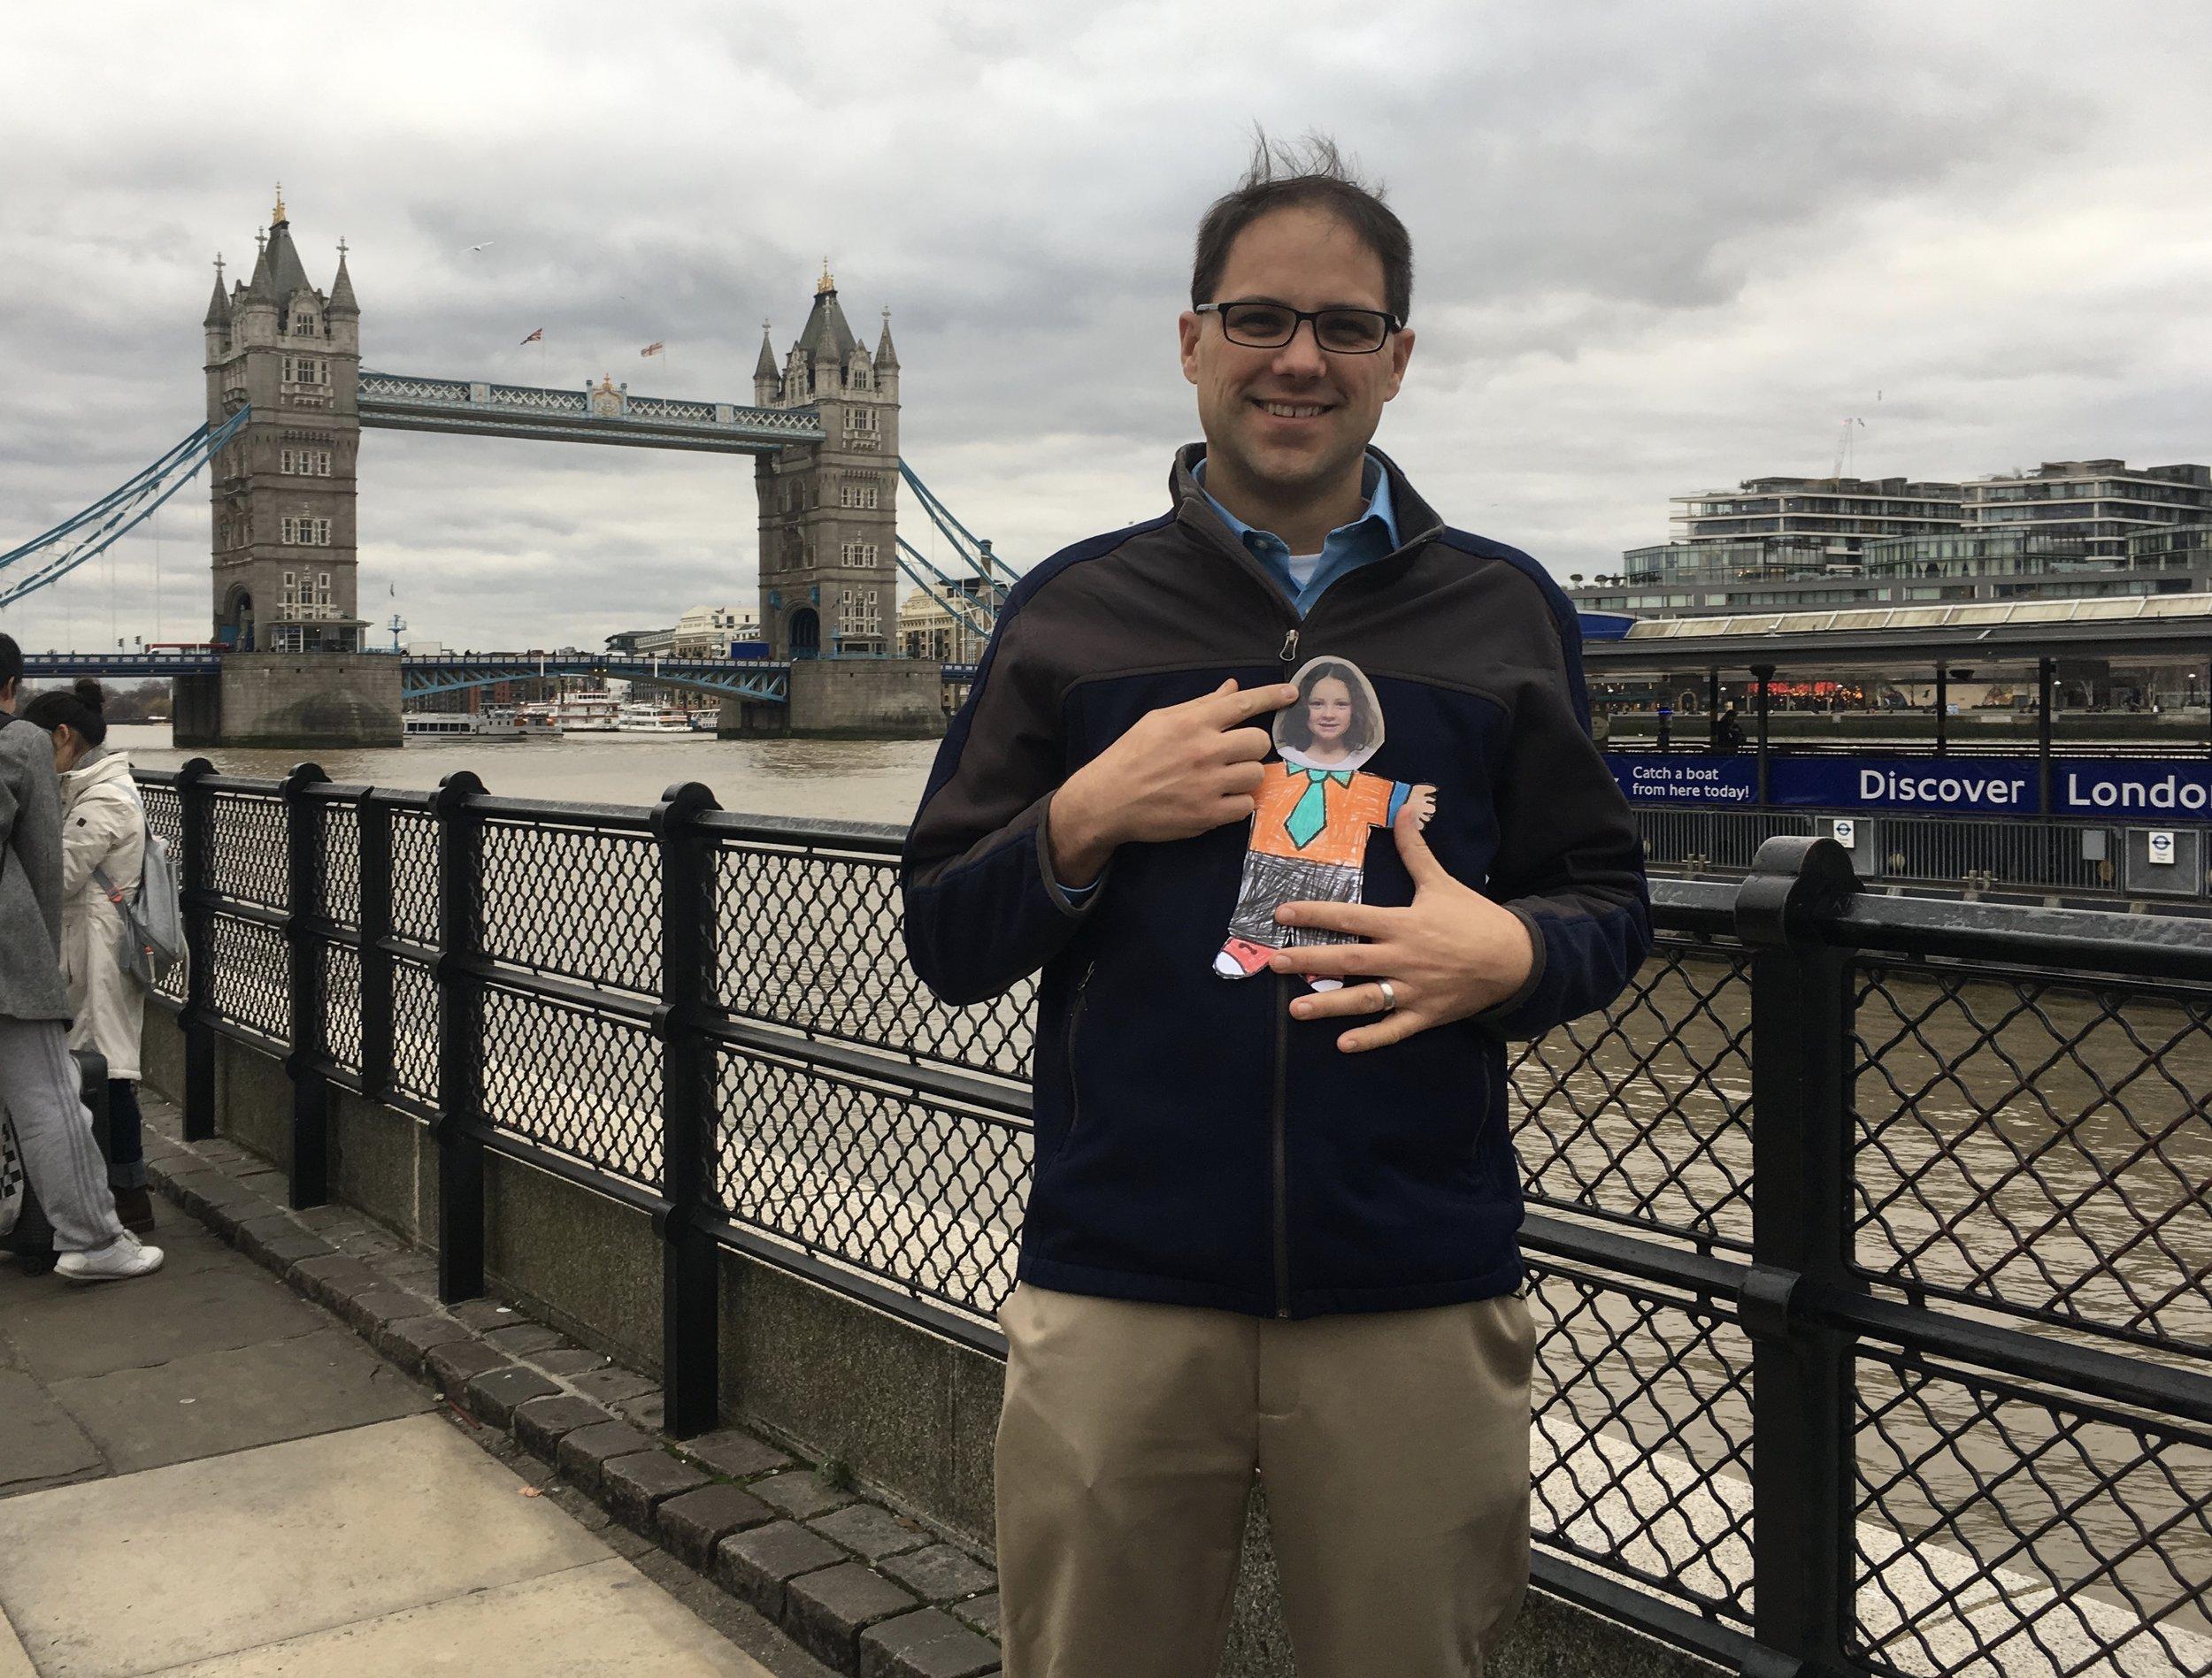 Shane in London as Emerge Business Accelerator finalist